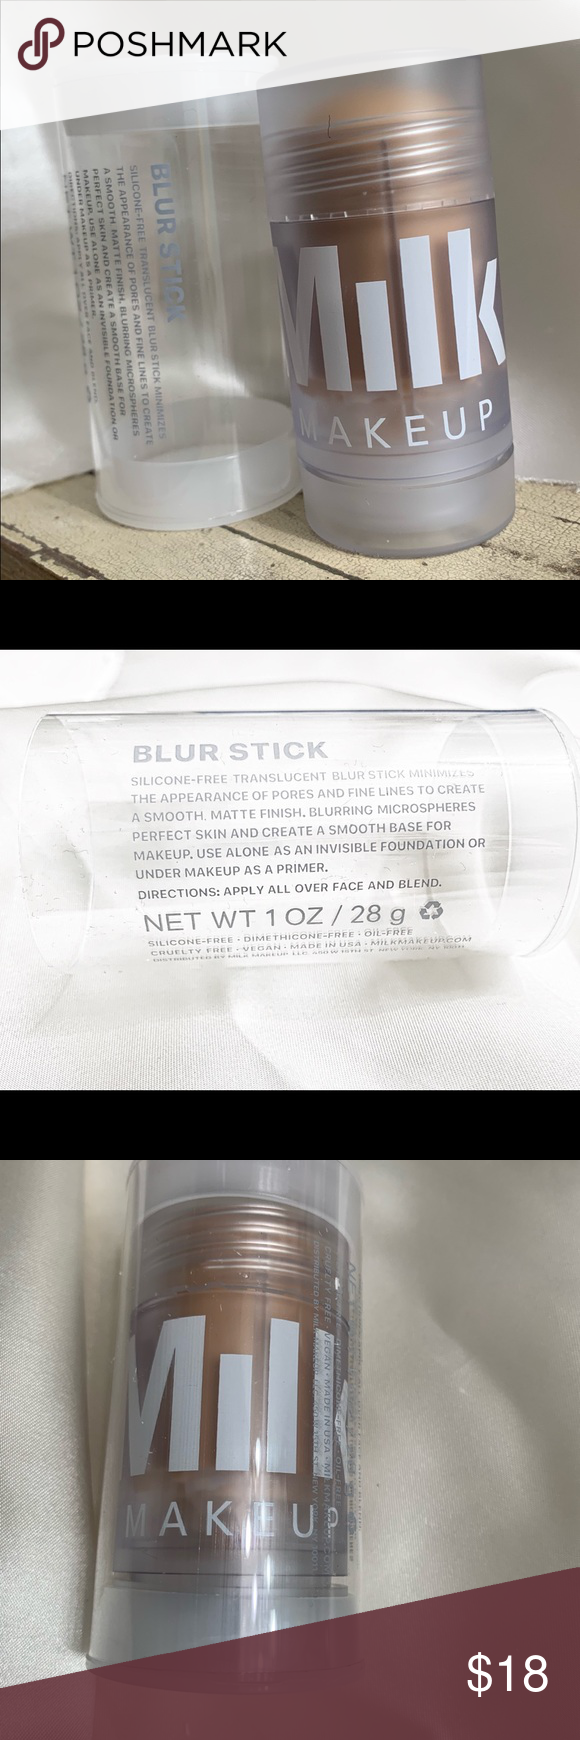 Milk Blur Stick Matte Blurring Primer Full Size Boutique